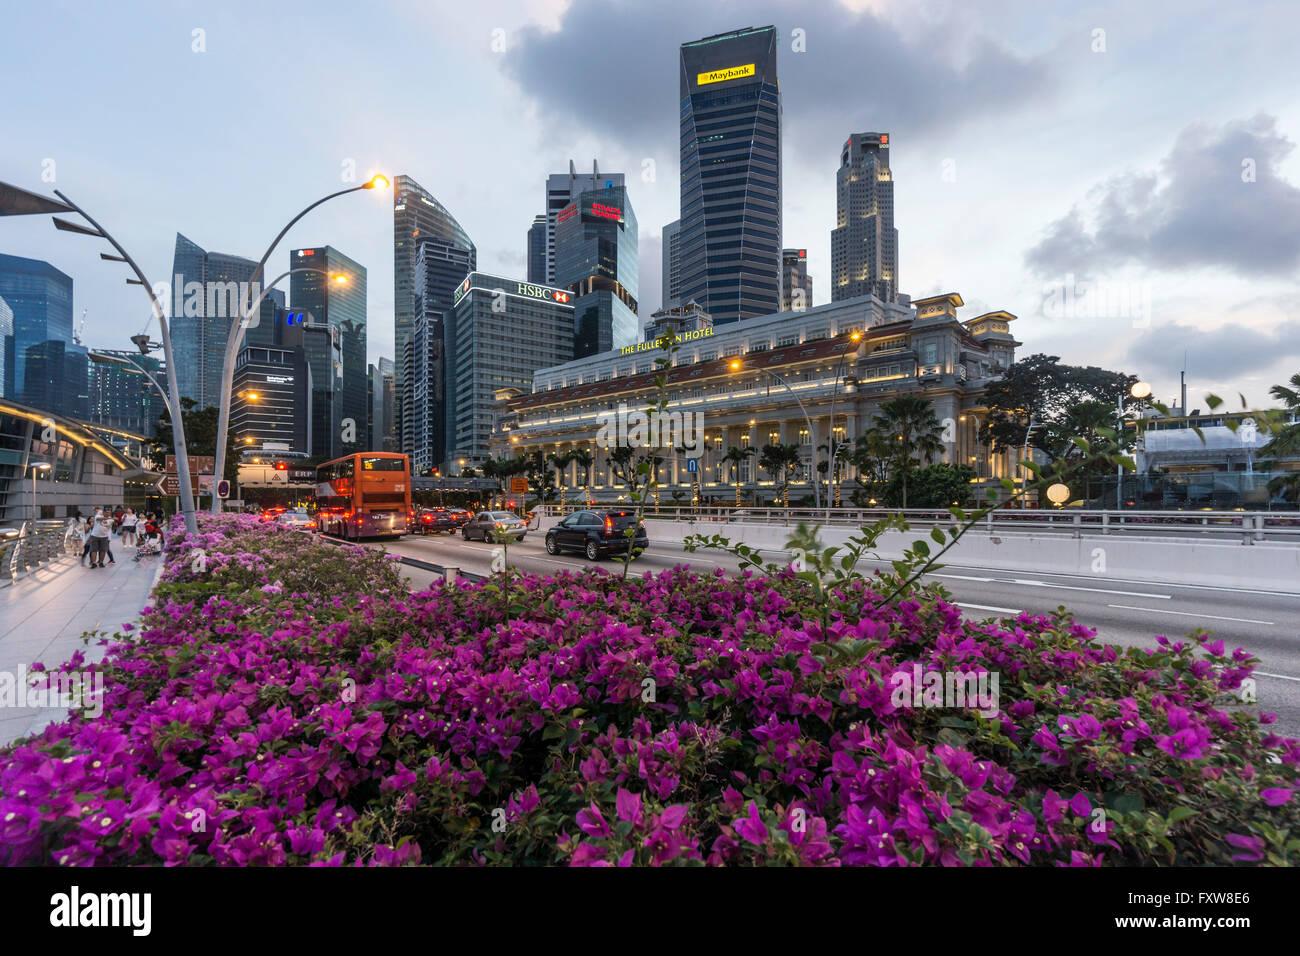 Financial District, Fullerton Hotel, Skyscraper,  Twilight,  Singapore, Singapur, Southest Asia, travelstock44 Stock Photo